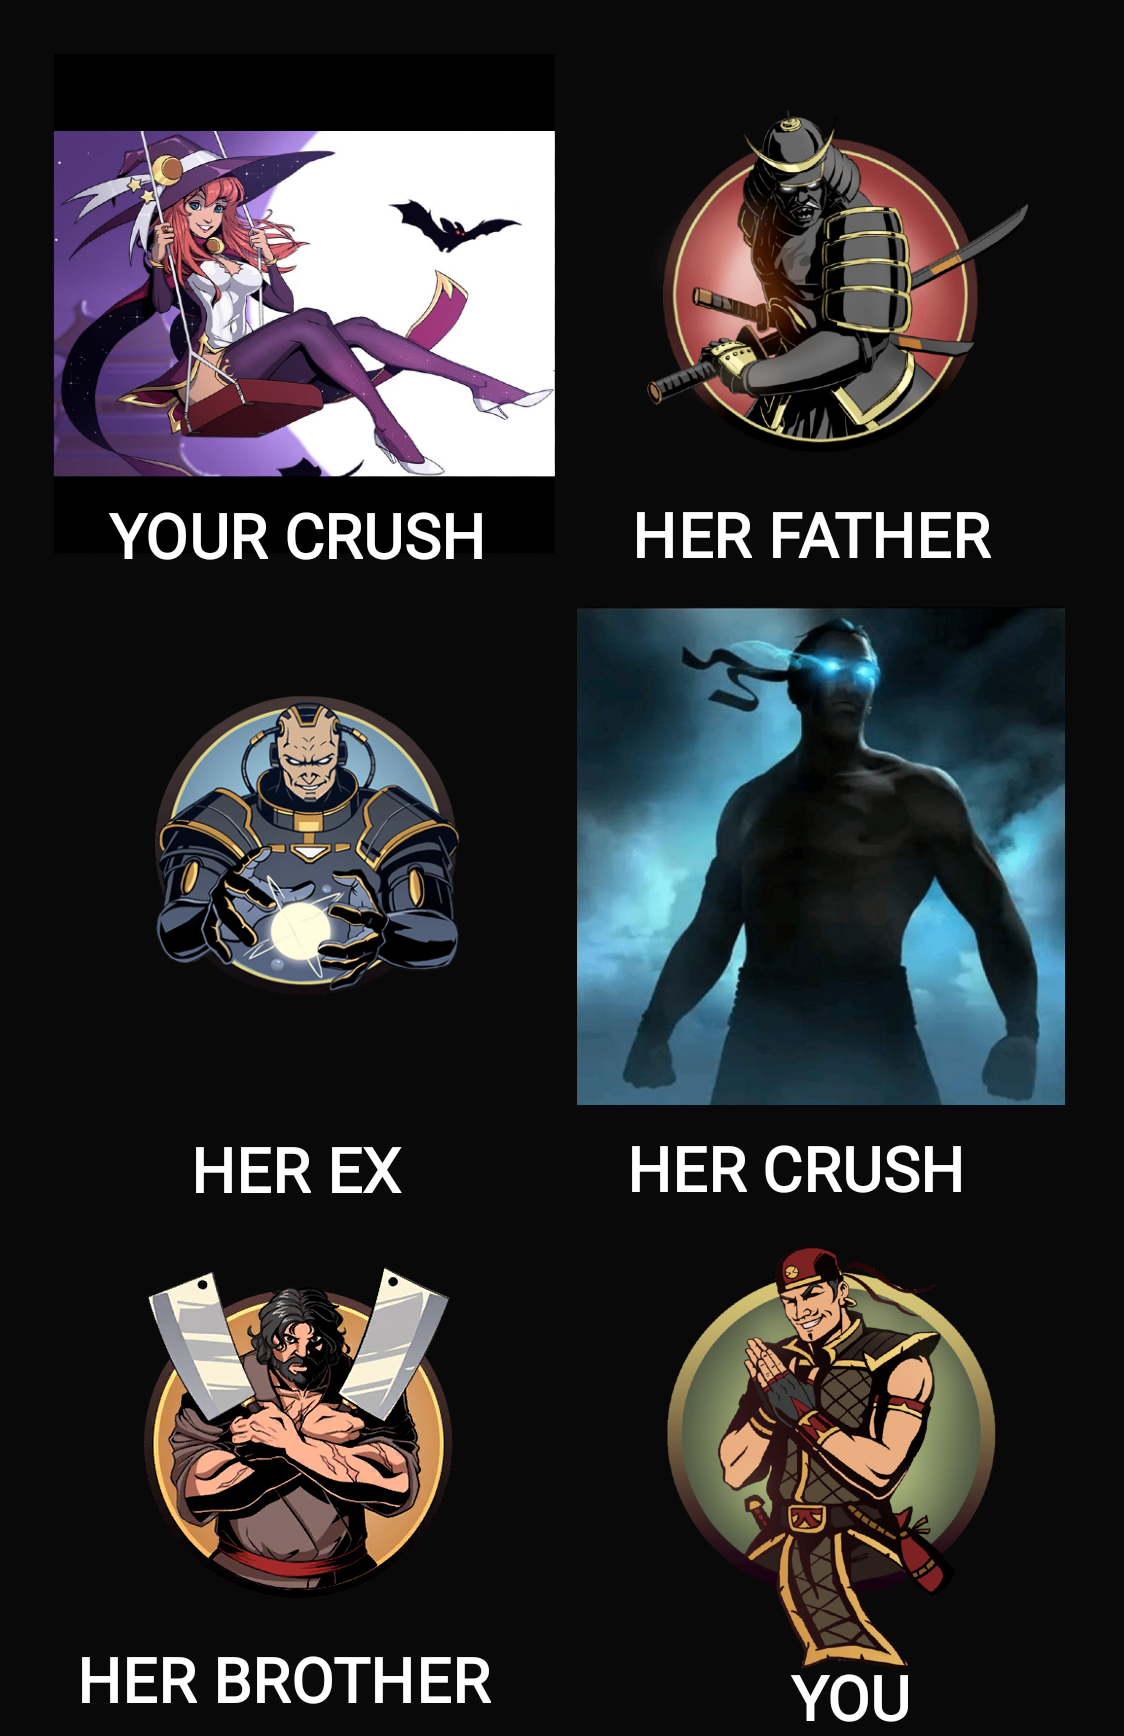 Sf2 crush